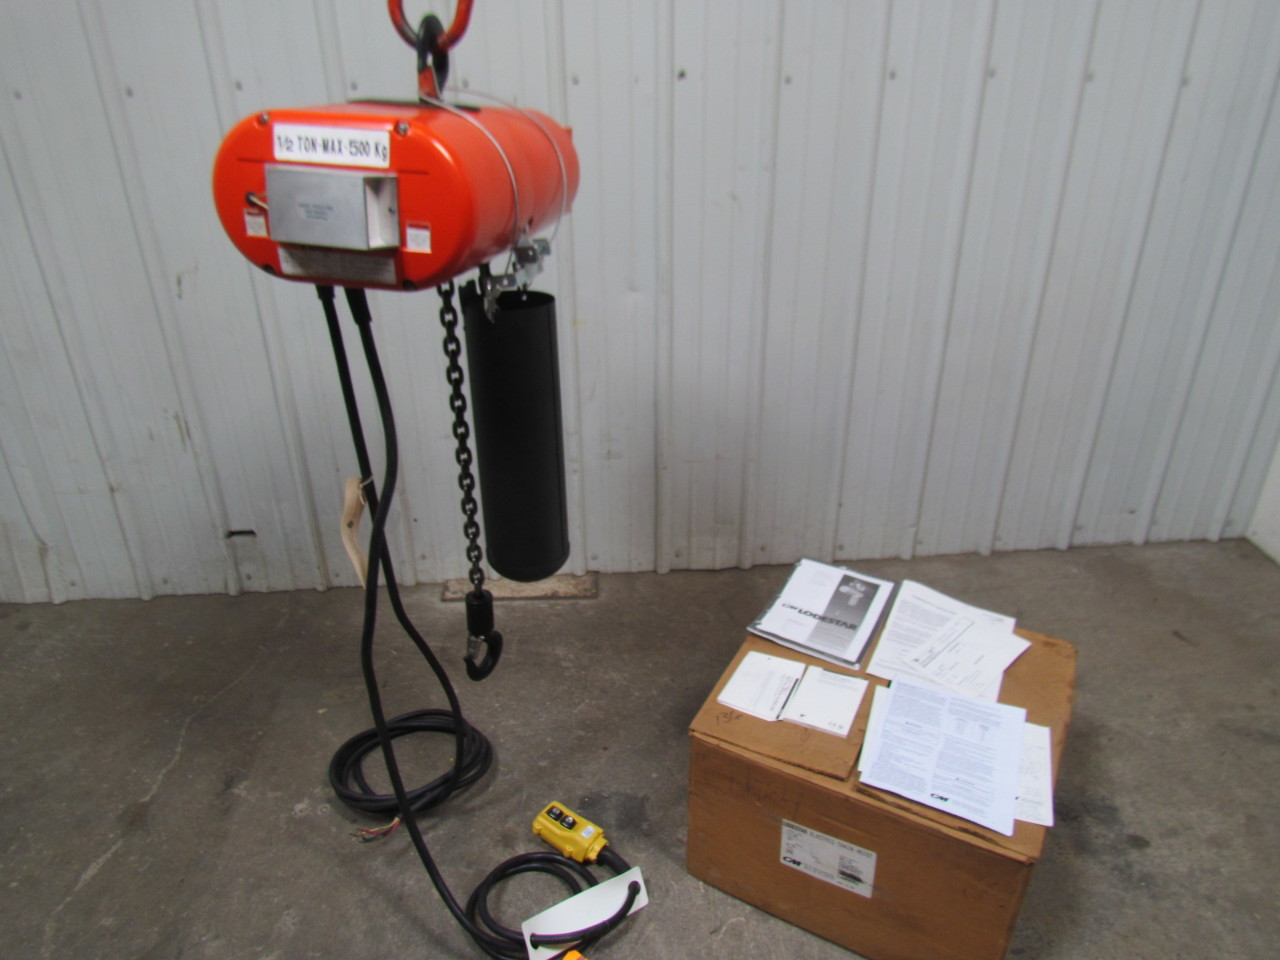 cm lodestar jj 1 2 ton 460v 3ph electric chain hoist 5 On cm lodestar 1 ton motor